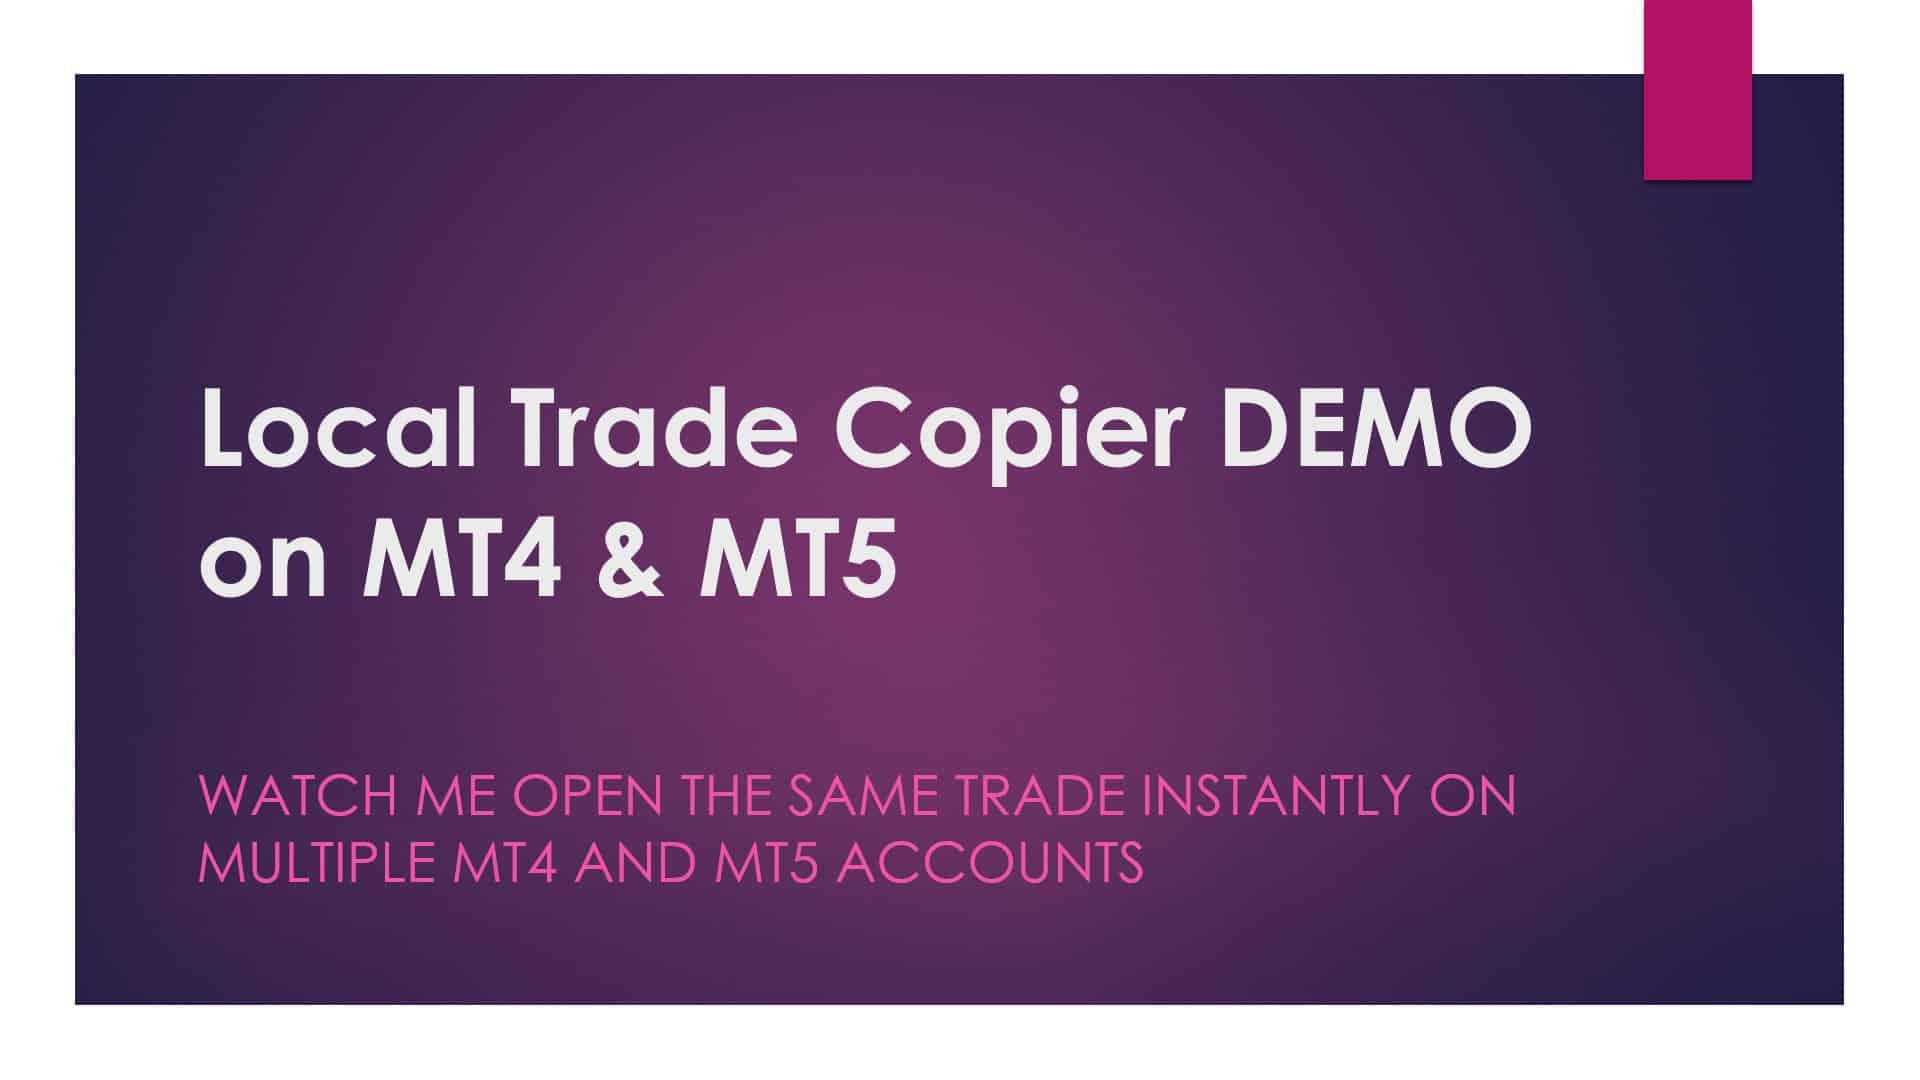 Local Trade Copier DEMO on MT4 and MT5